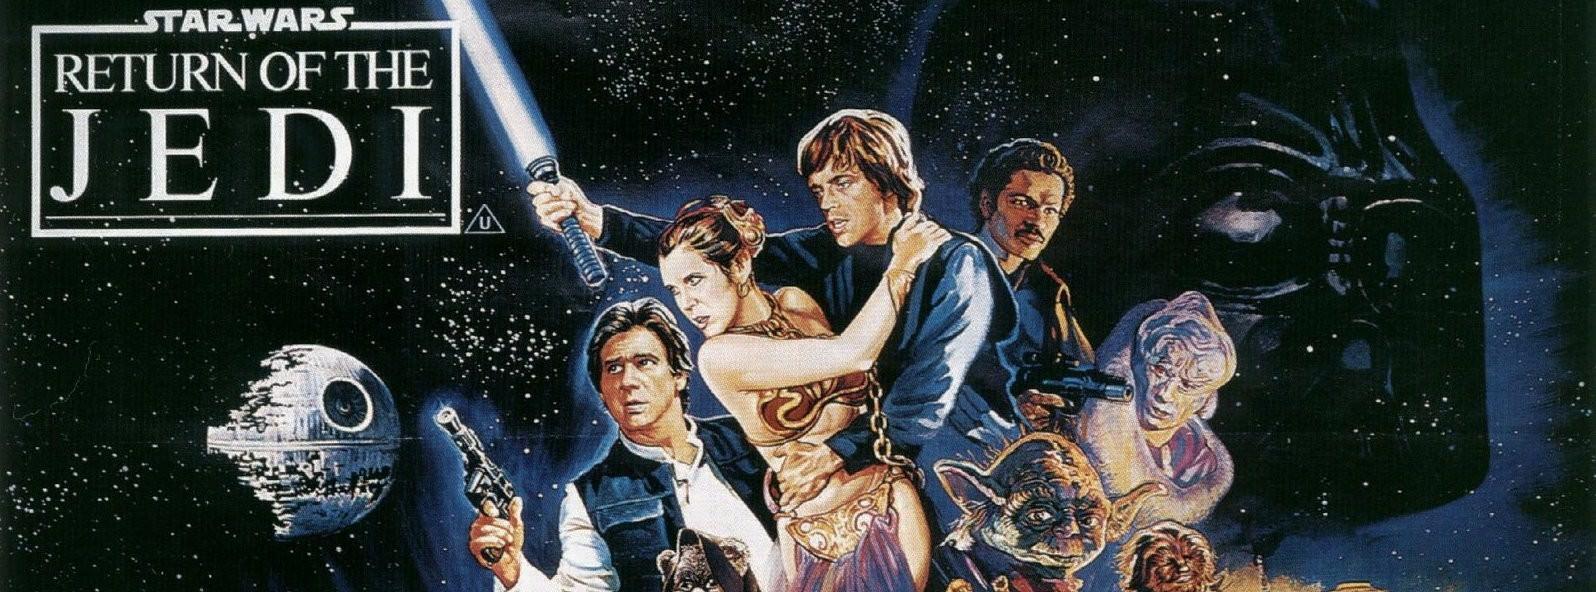 Movie, Star Wars Episode VI: Return of the Jedi(美國, 1983) / 星際大戰六部曲:絕地大反攻(台灣) / 星球大战VI:绝地归来(中國) / 星球大戰:武士復仇(香港), 電影海報, 美國